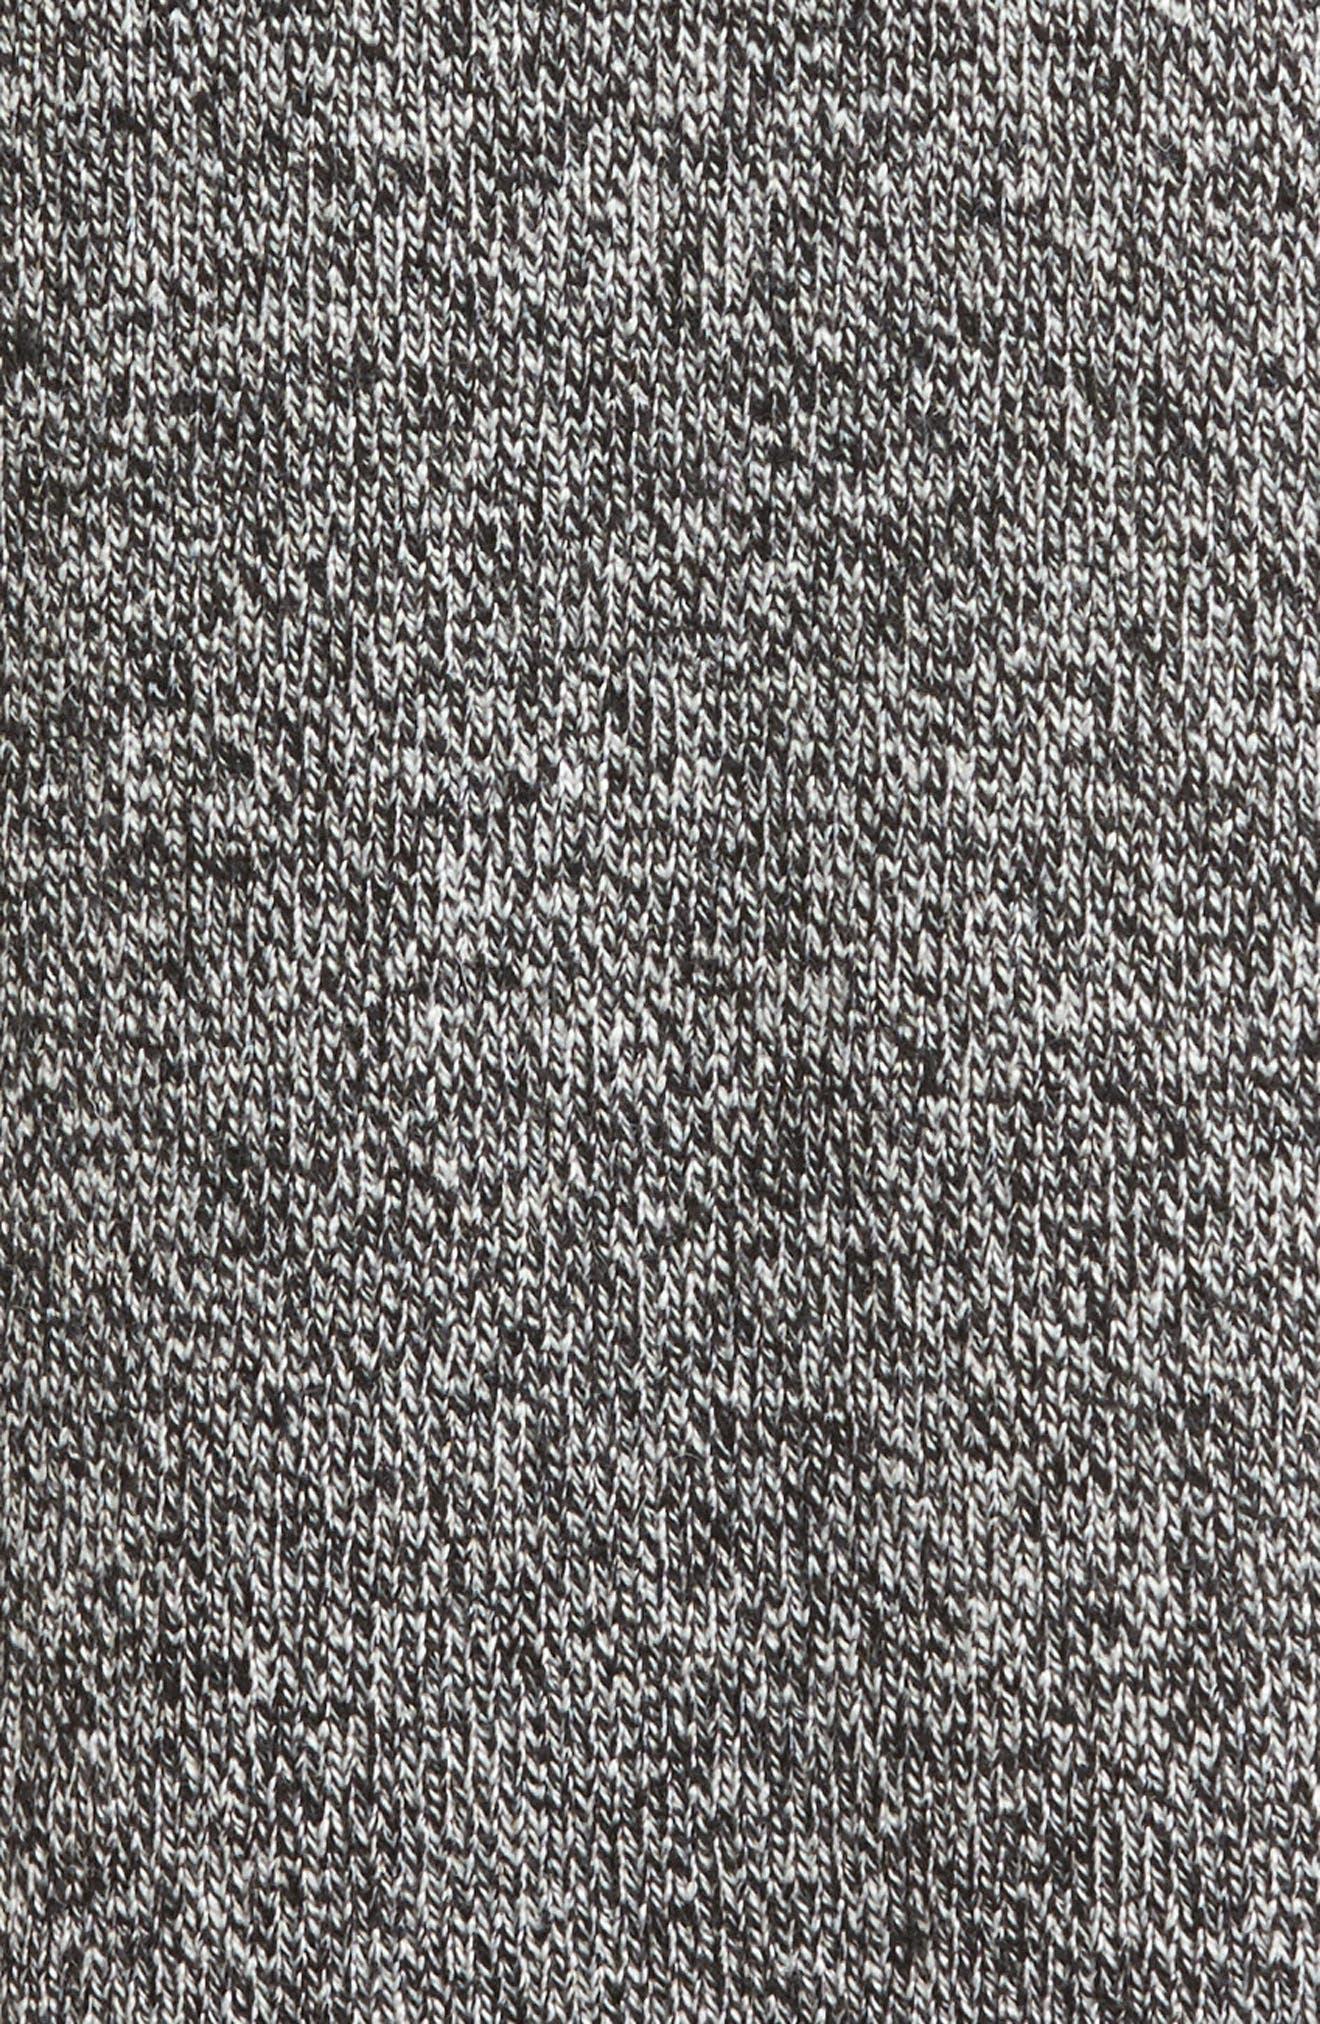 Side Slit Sweater,                             Alternate thumbnail 5, color,                             020